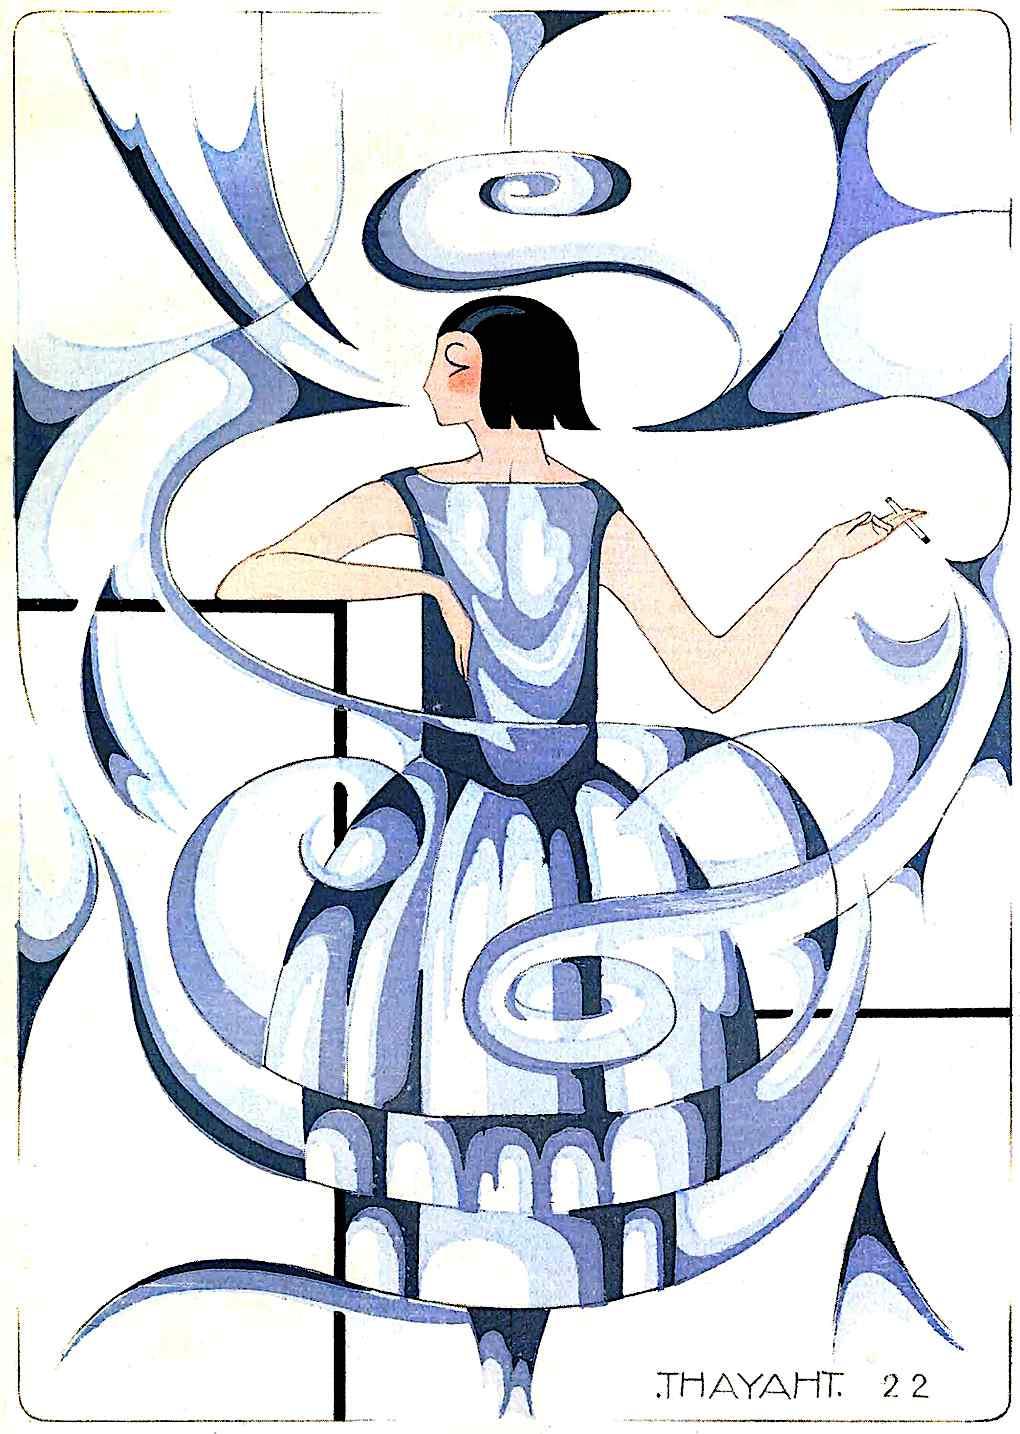 a 1922 fashion illustration of a woman smoking